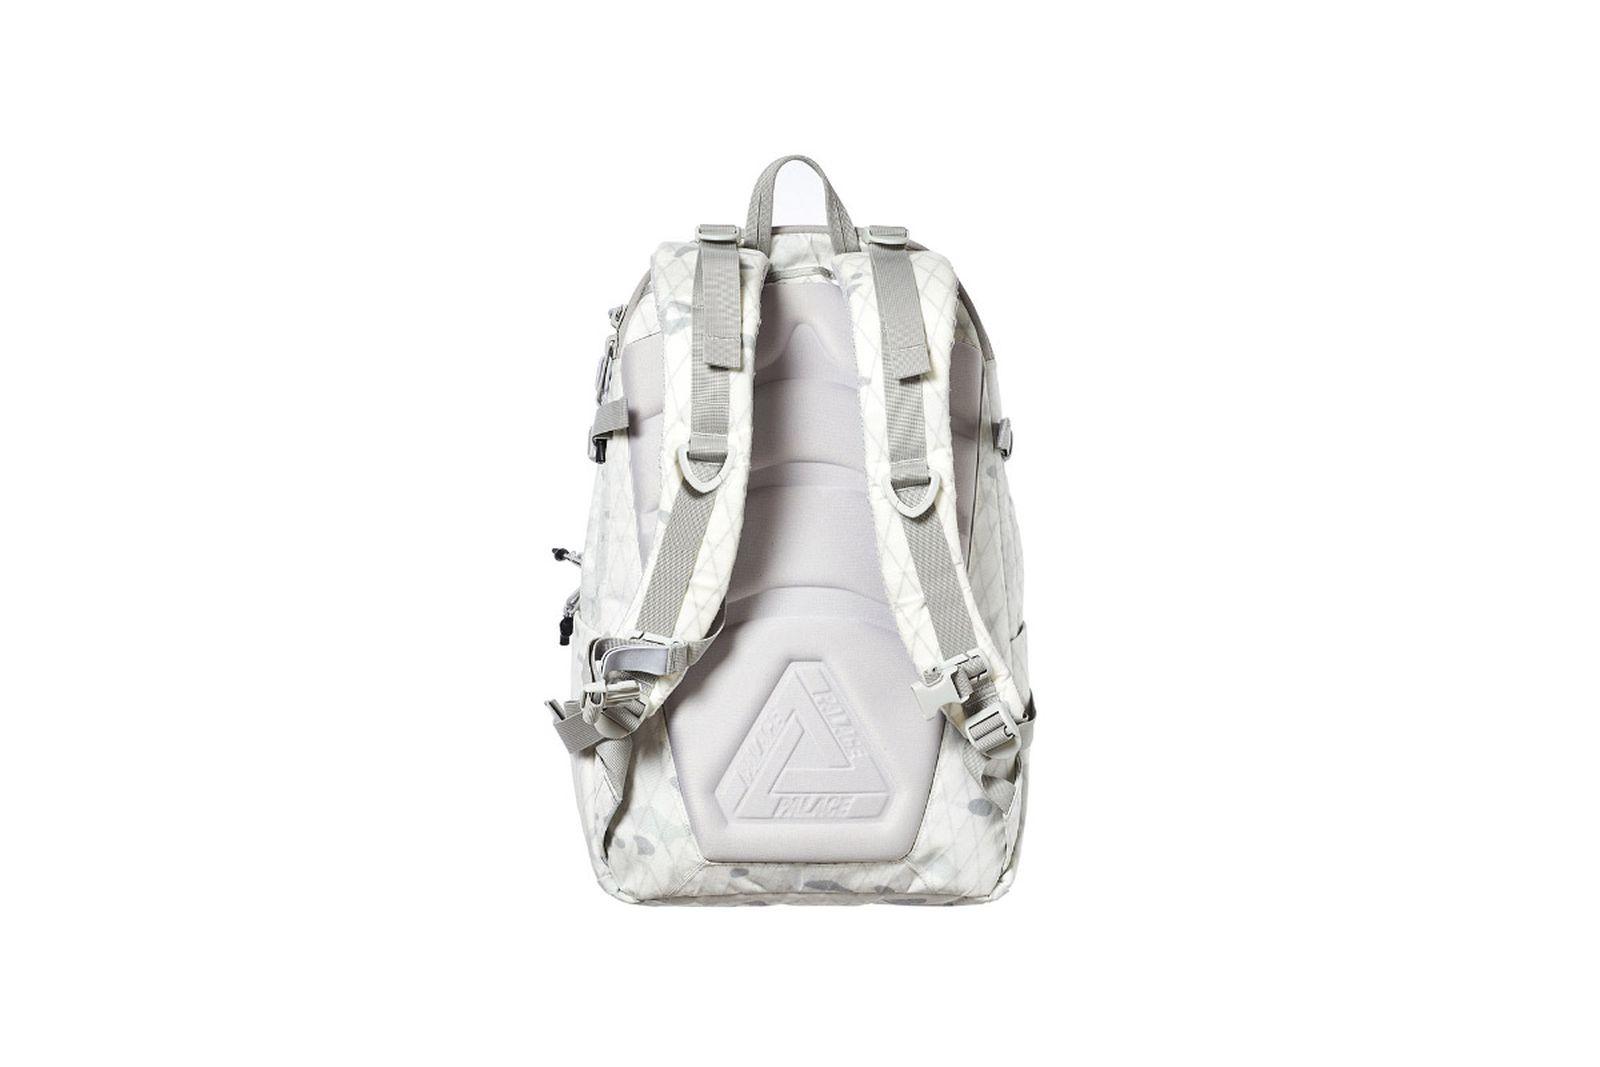 Palace 2019 Autumn Bag Back Pack tech original white camo 1970 TWEAKED